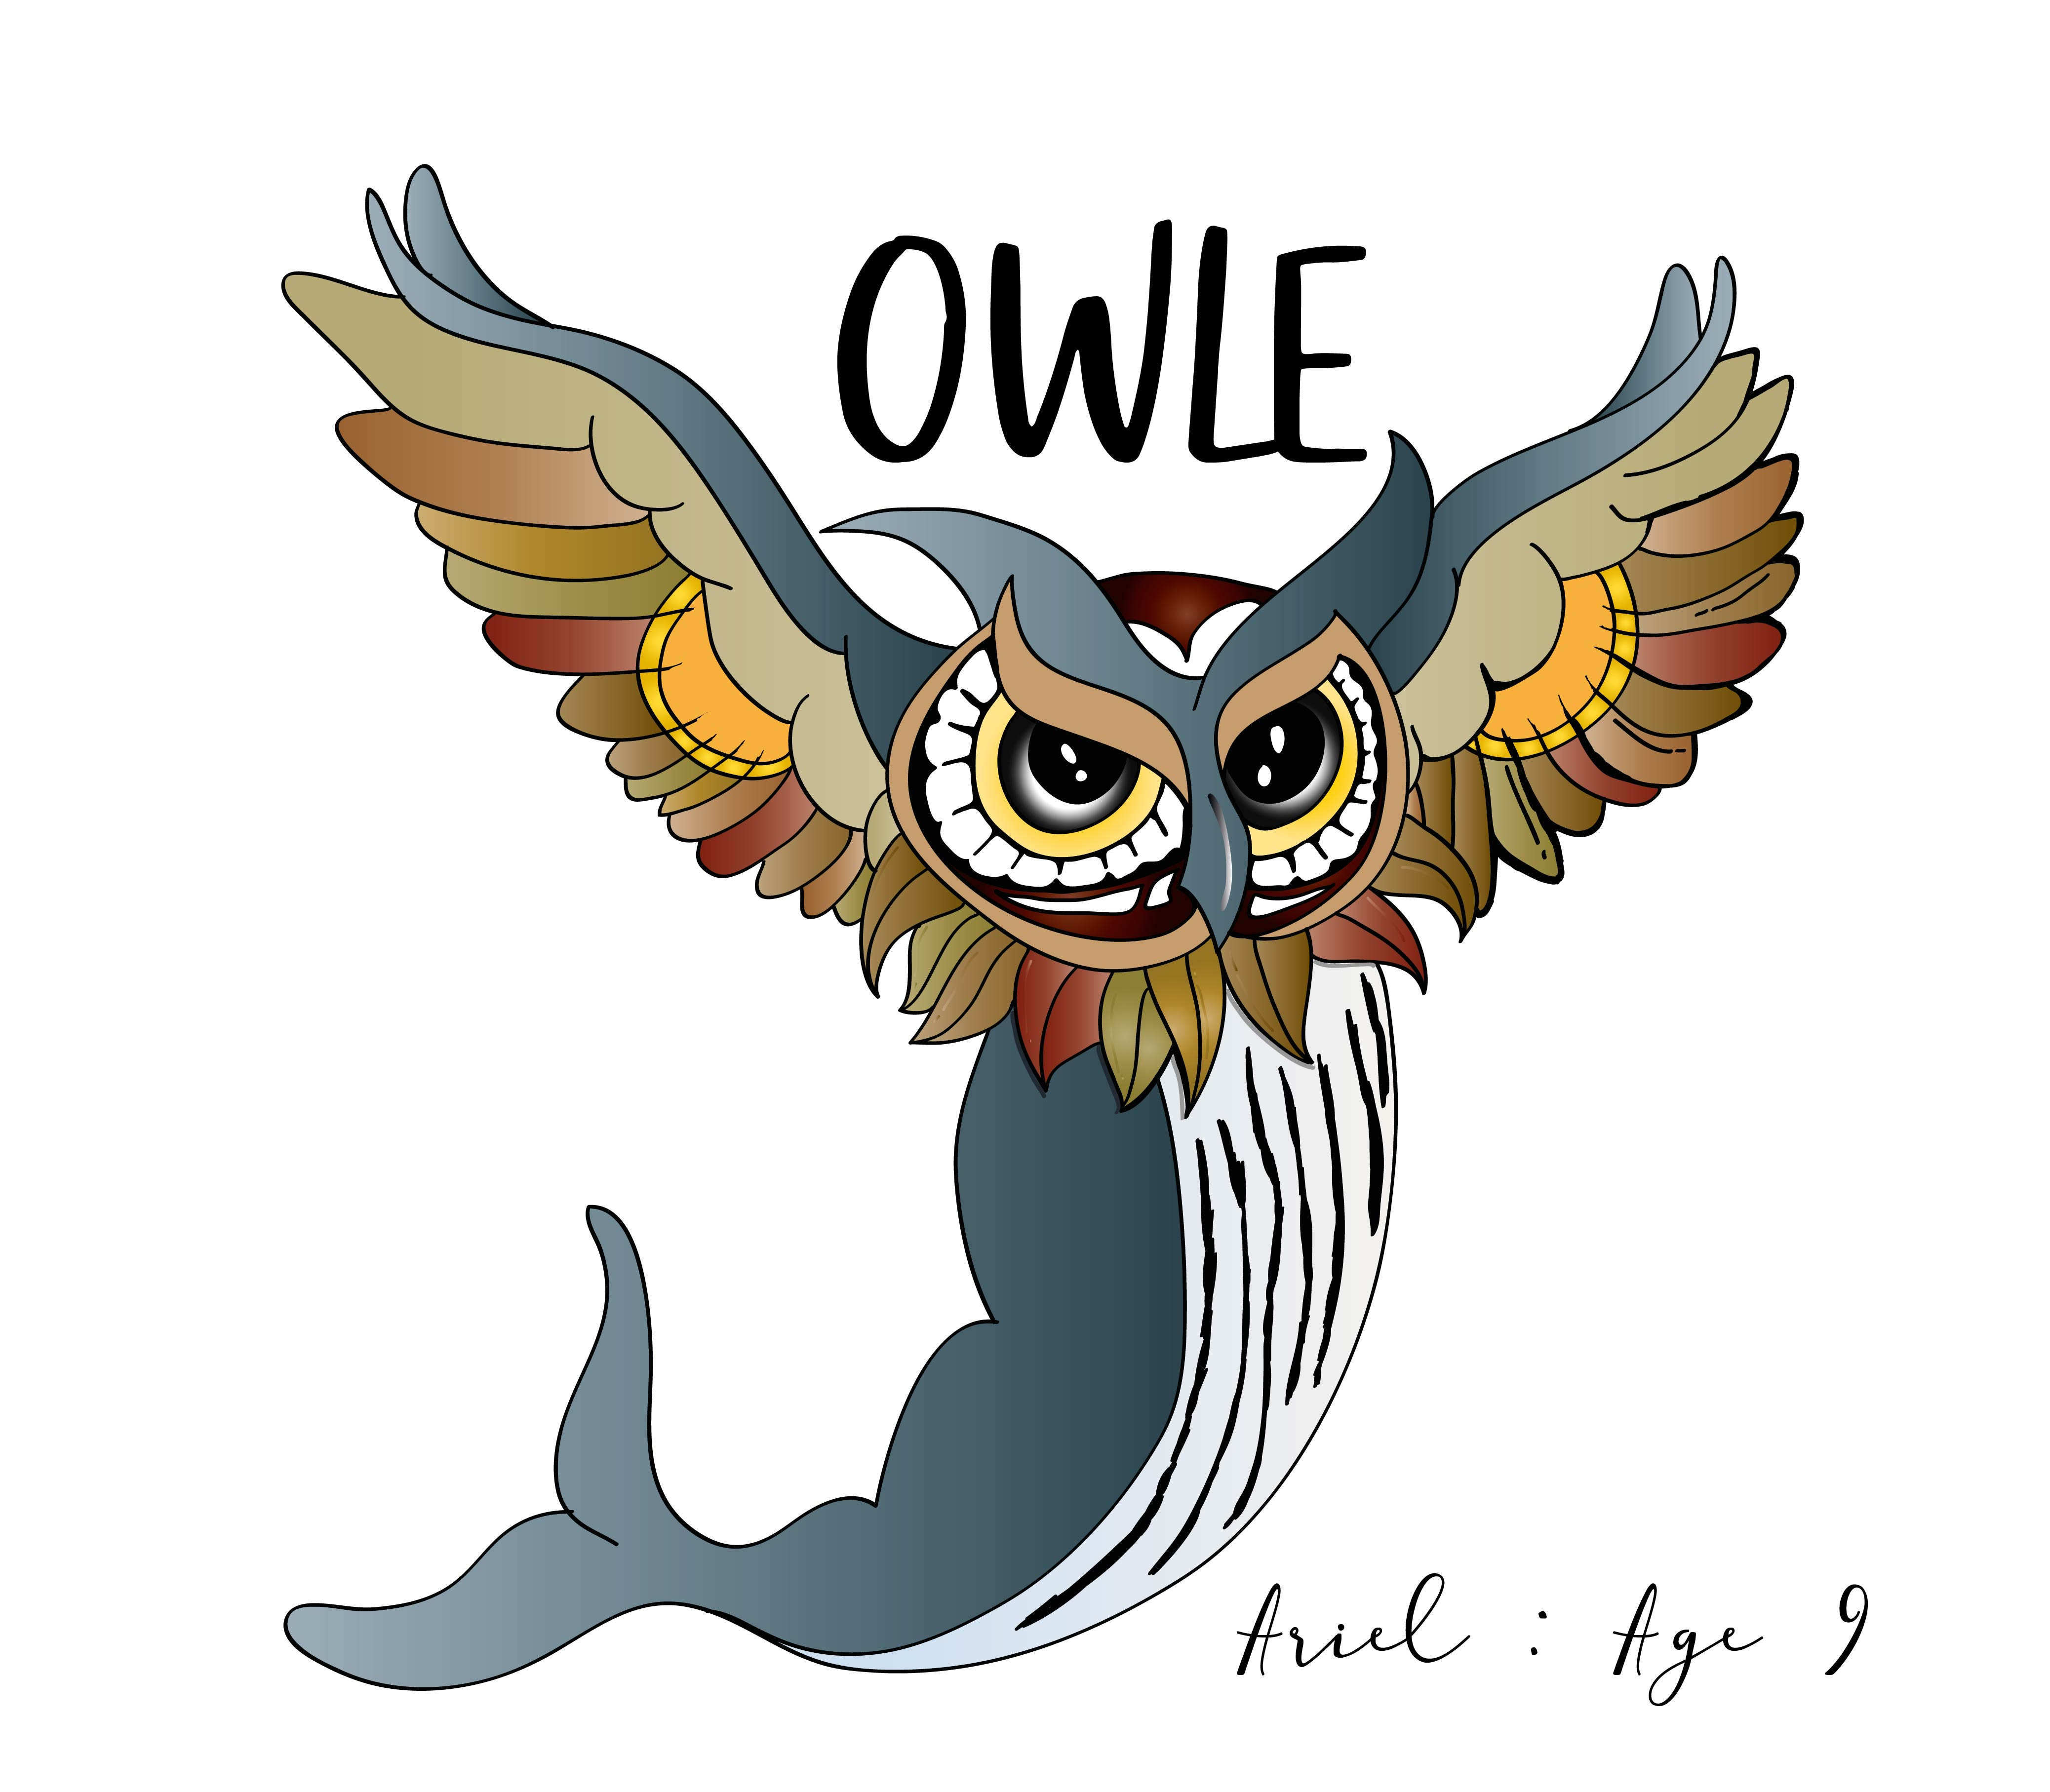 owle3-10